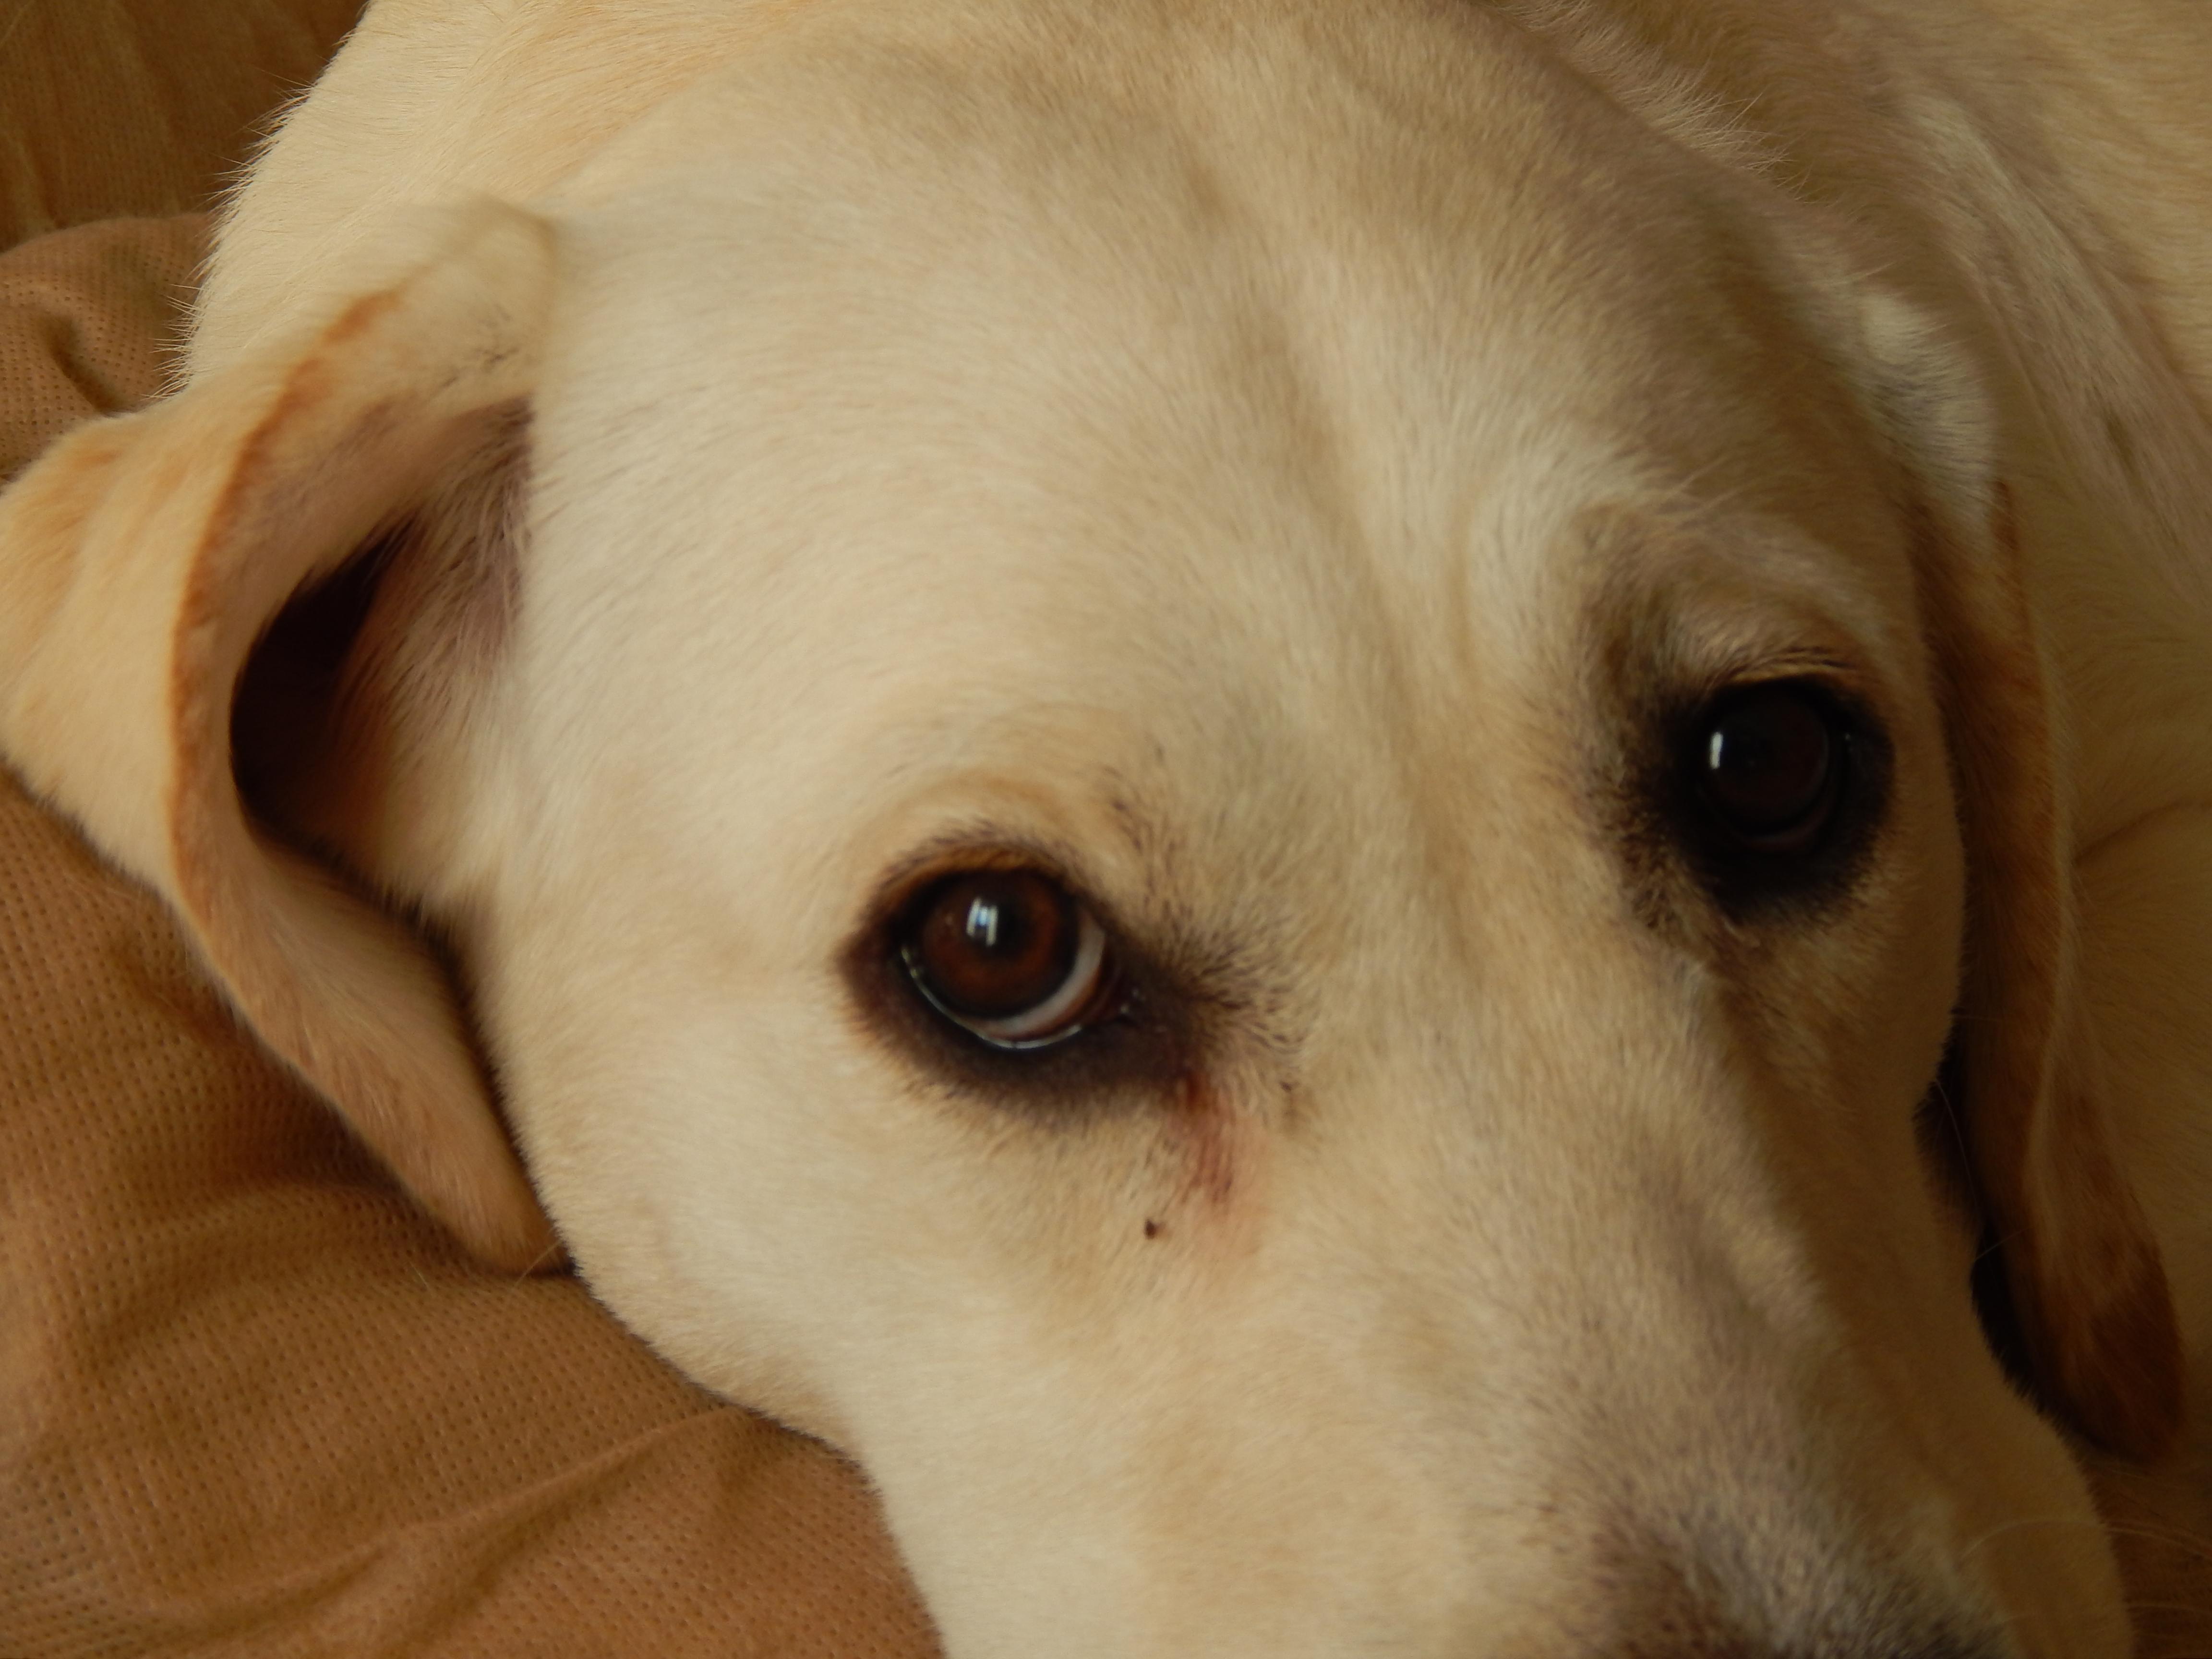 Labrador, Dog, Eyes, Lying, Sleepy, HQ Photo